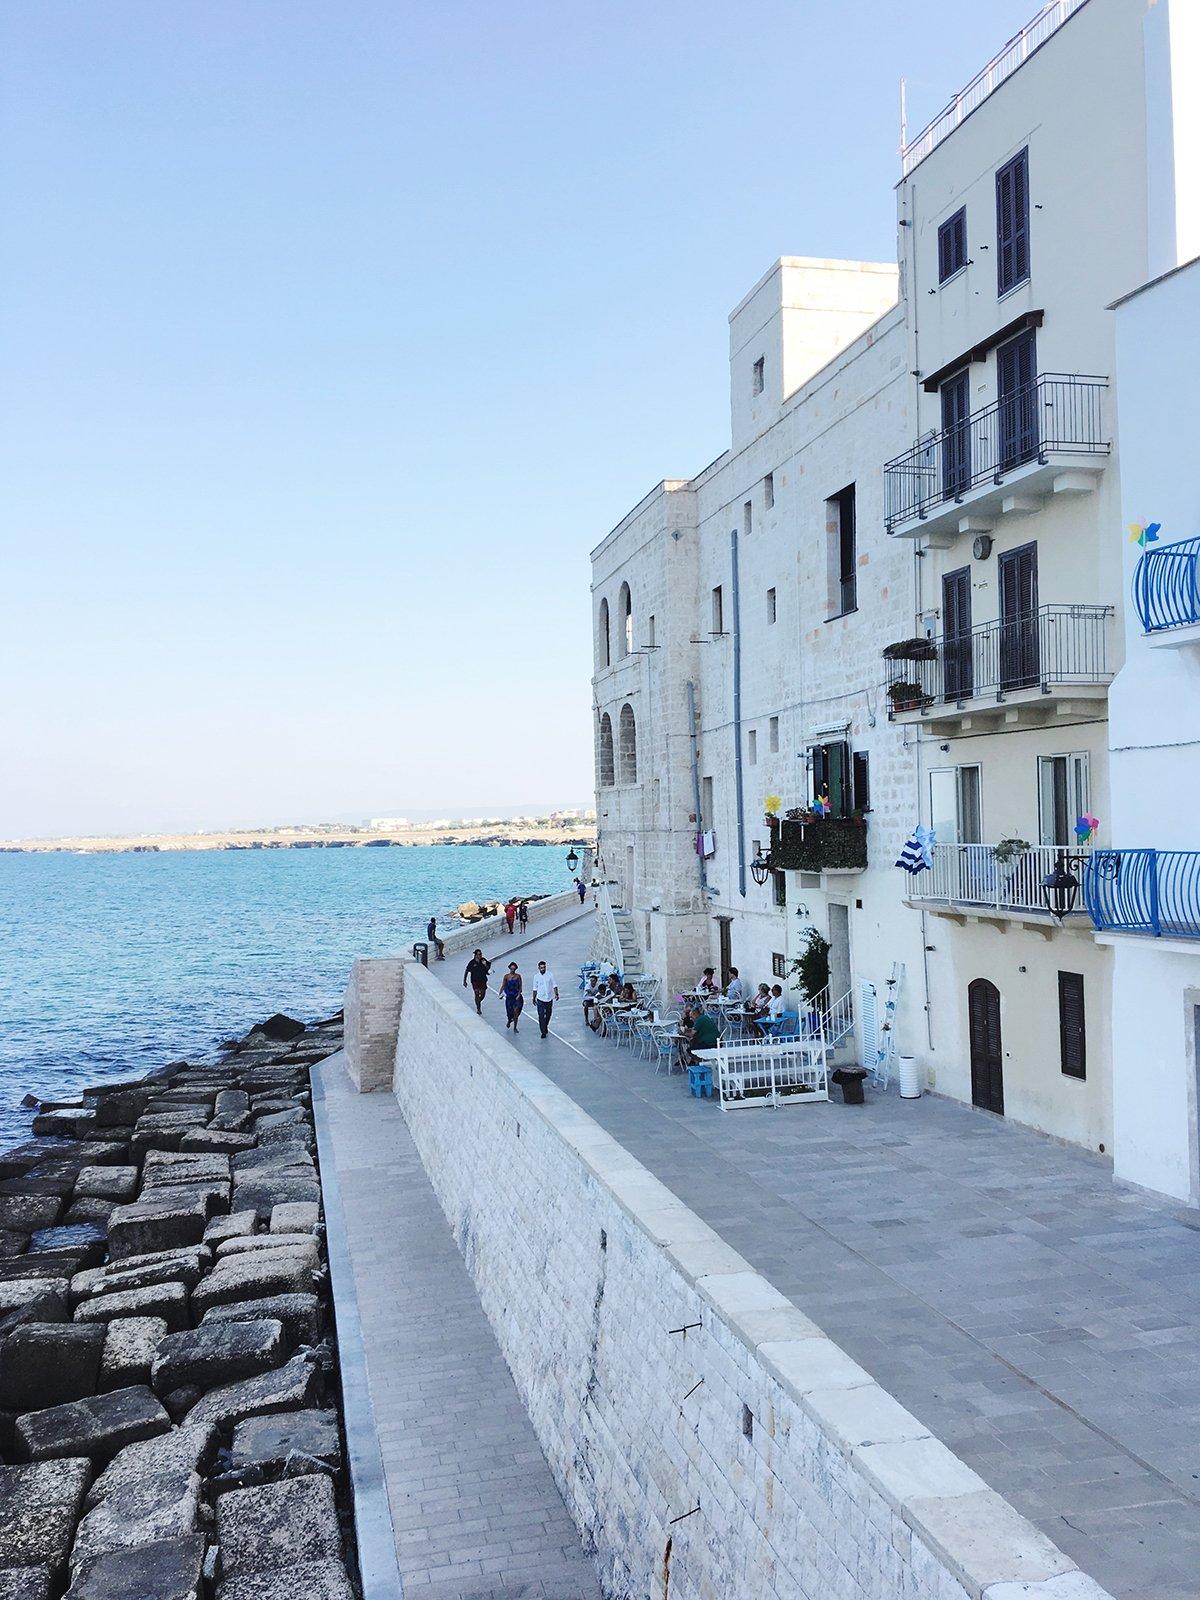 puglia_monopoli_view_buildings